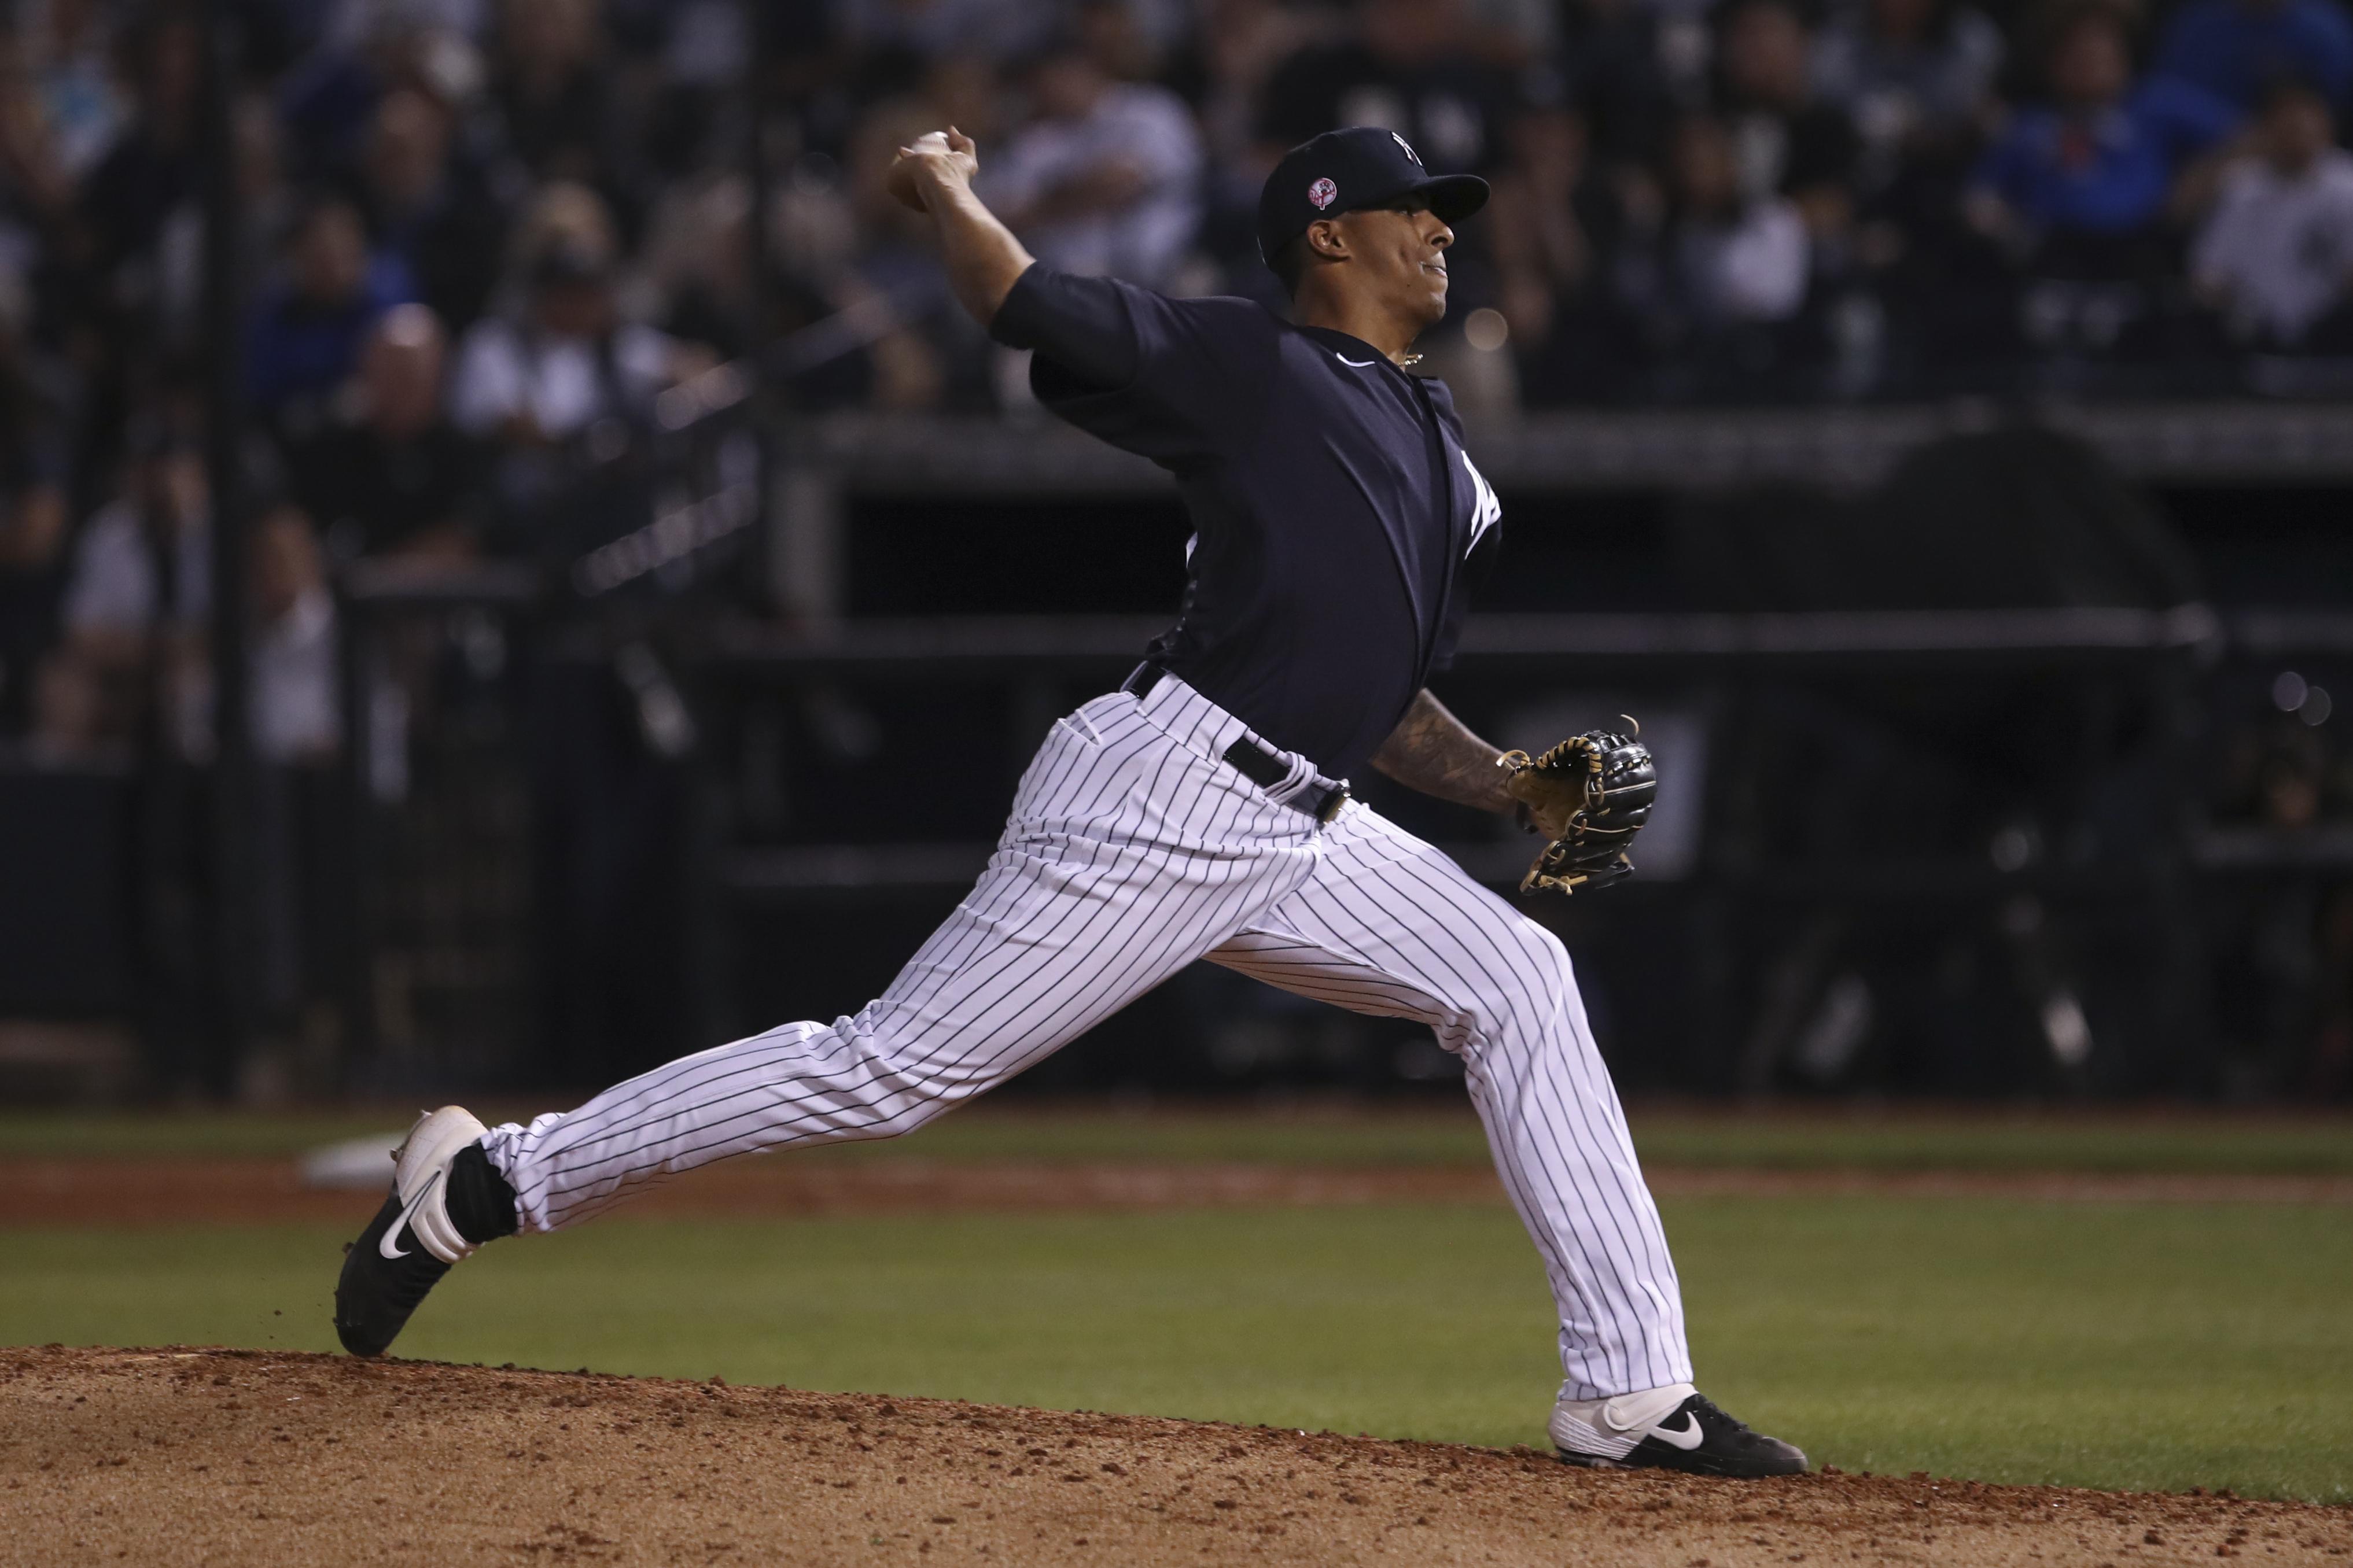 MLB: FEB 24 Spring Training - Pirates at Yankees